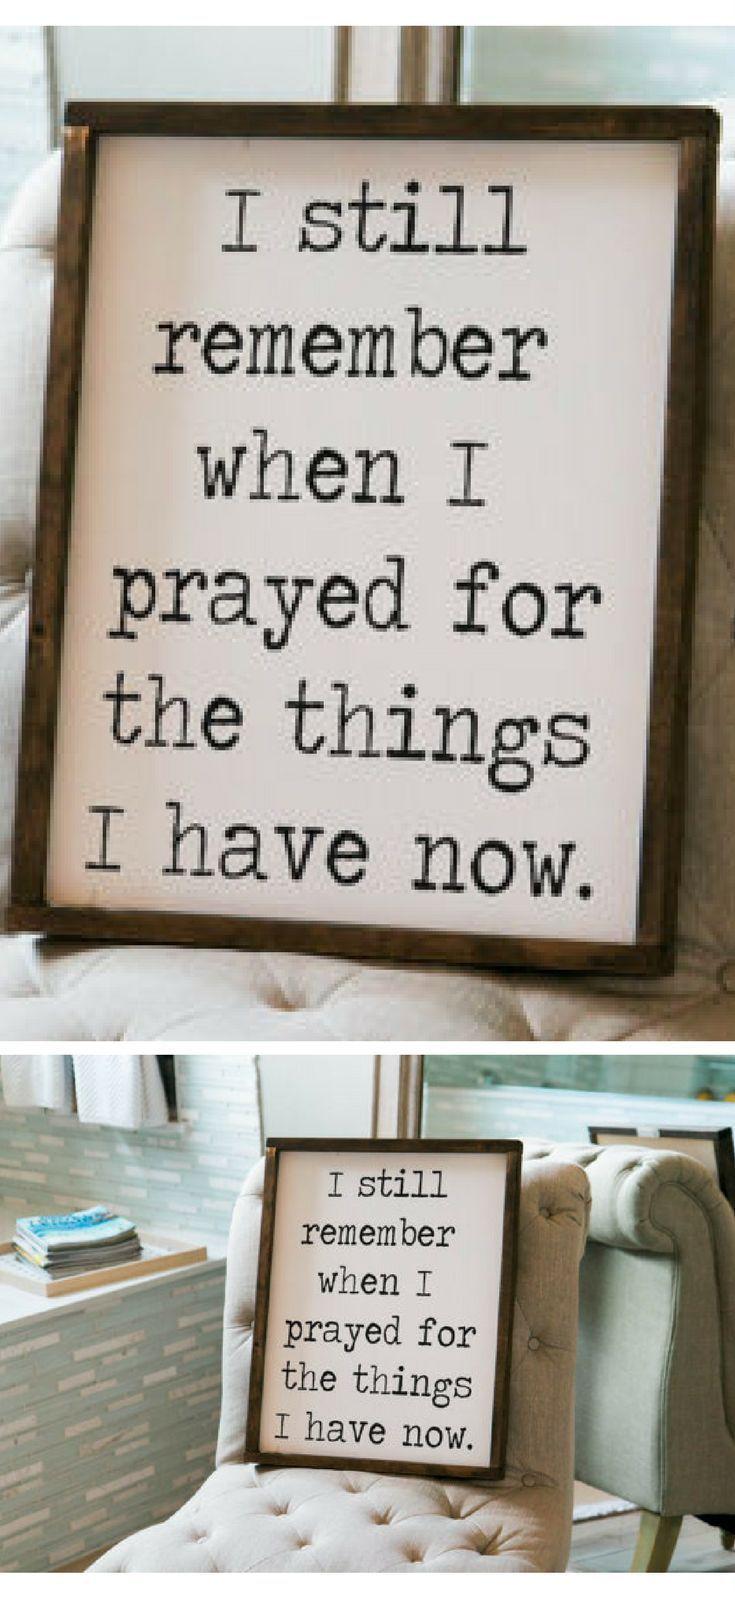 & I hope I always will!❤